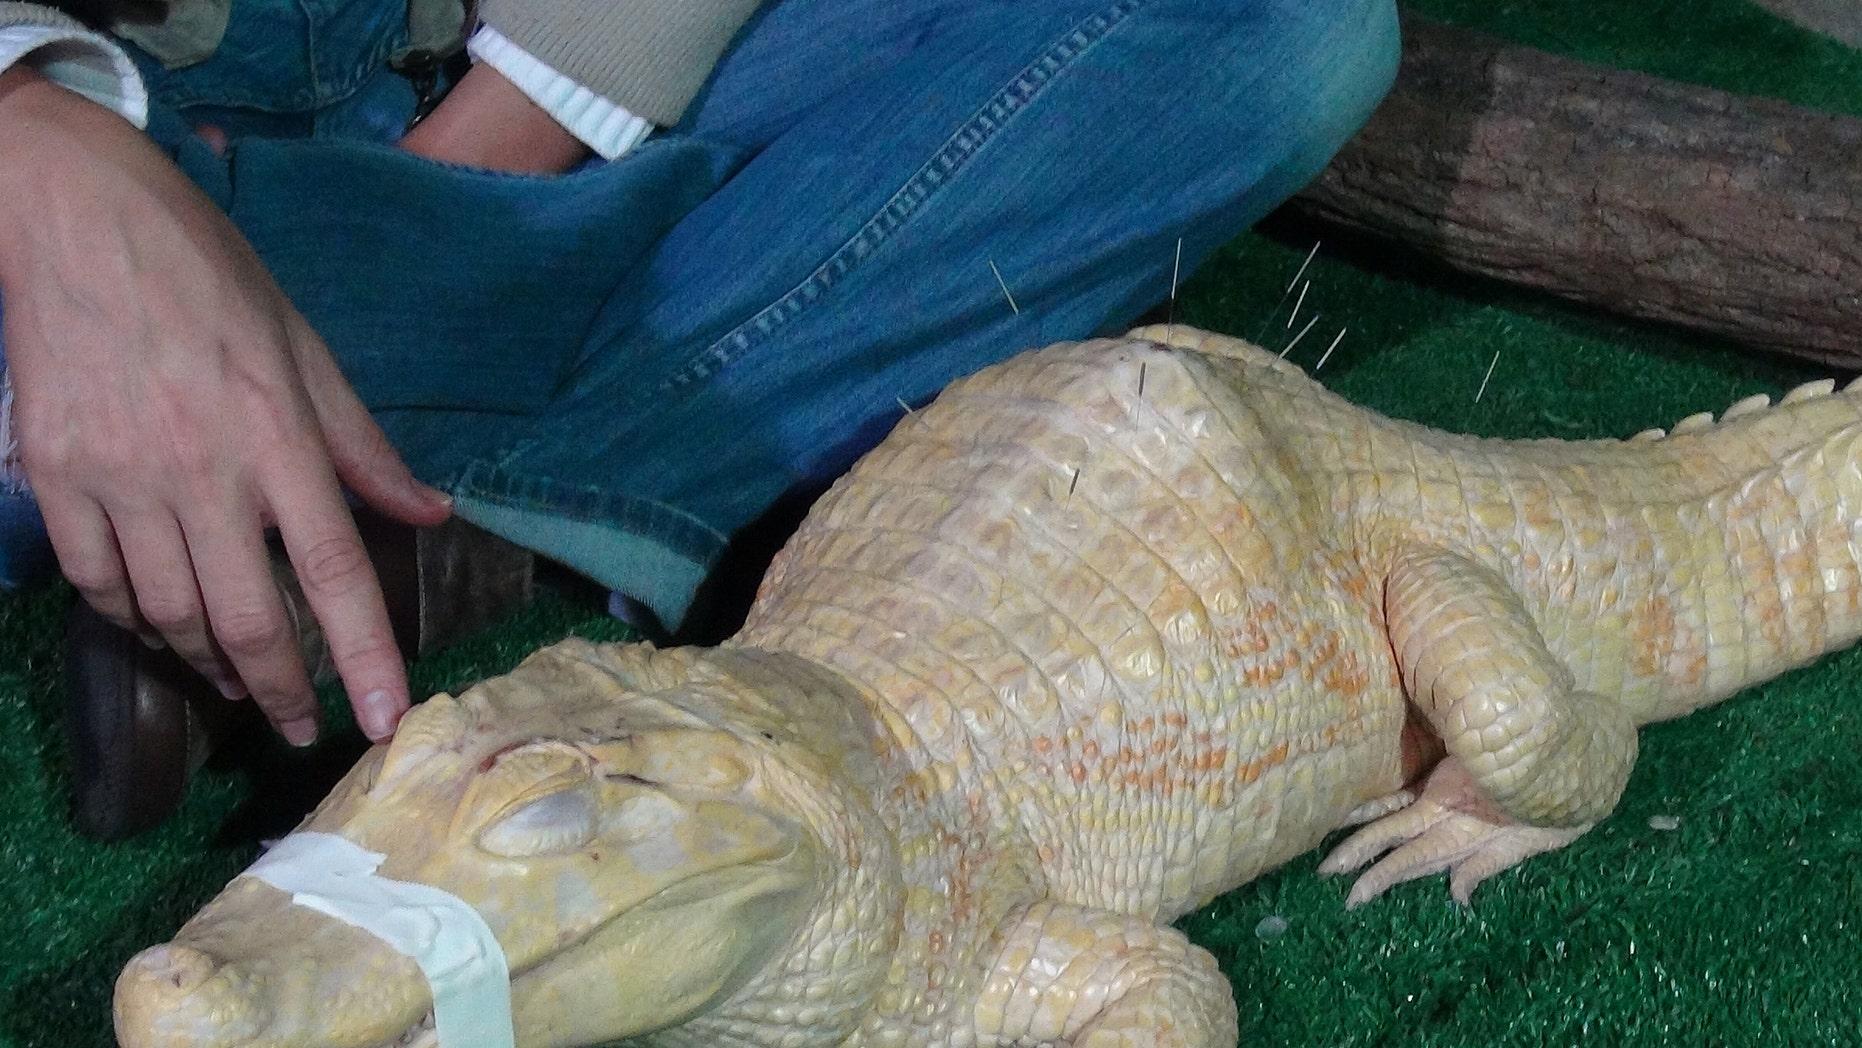 Bino, the albino alligator, receives acupuncture treatment in Sao Paulo, Brazil, Tuesday, Aug 27, 2013.